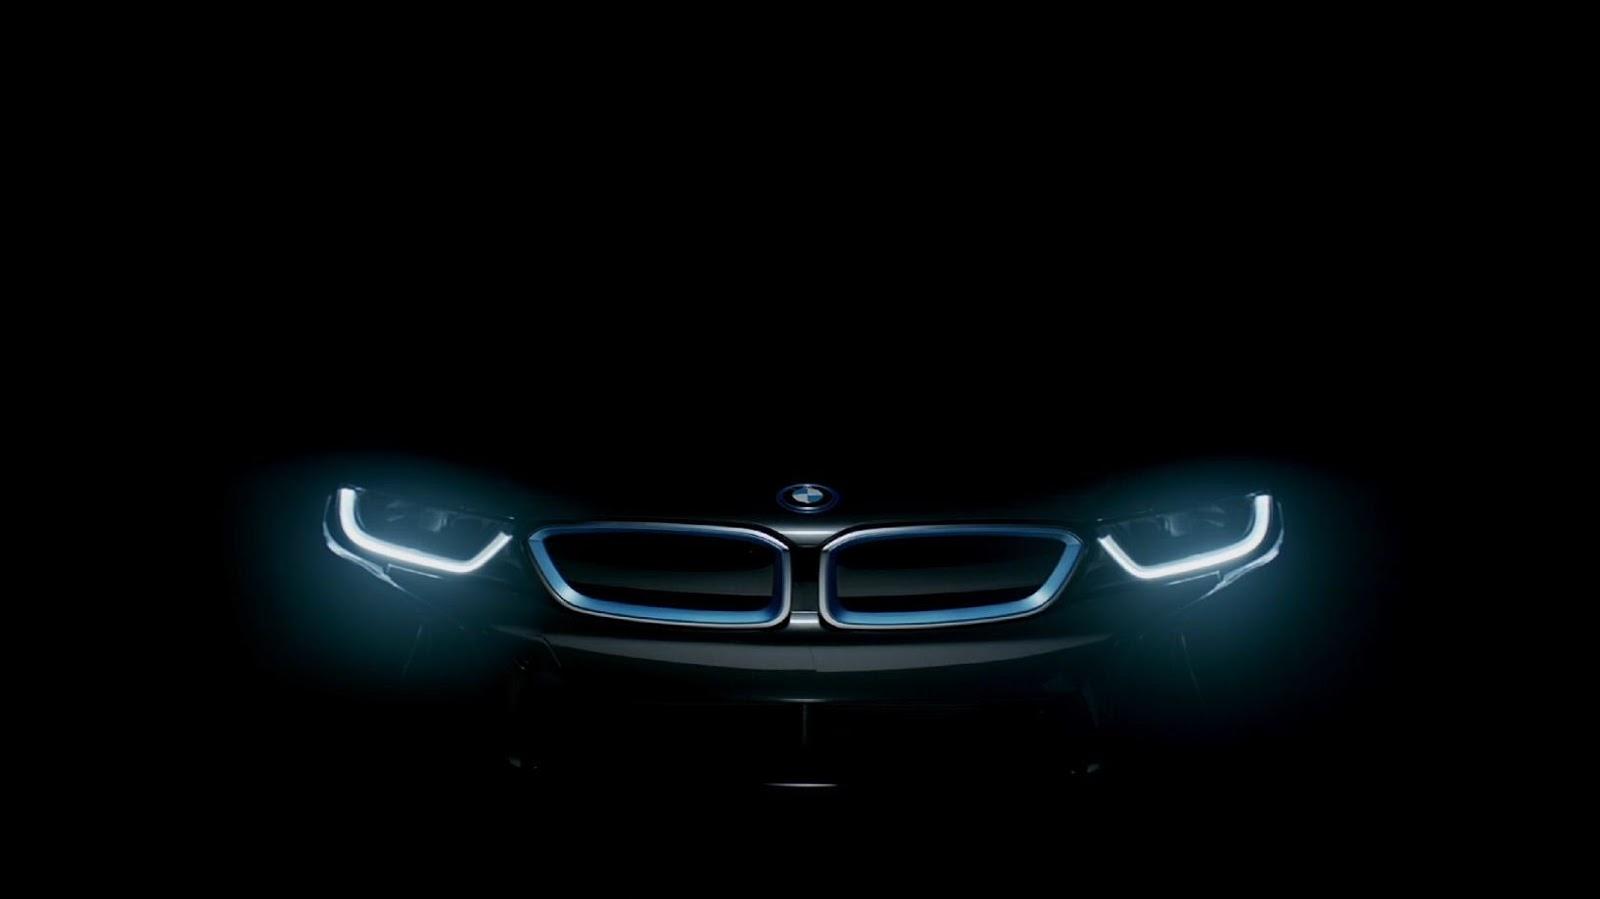 Otomotif Bmw I8 Sport And Futuristic